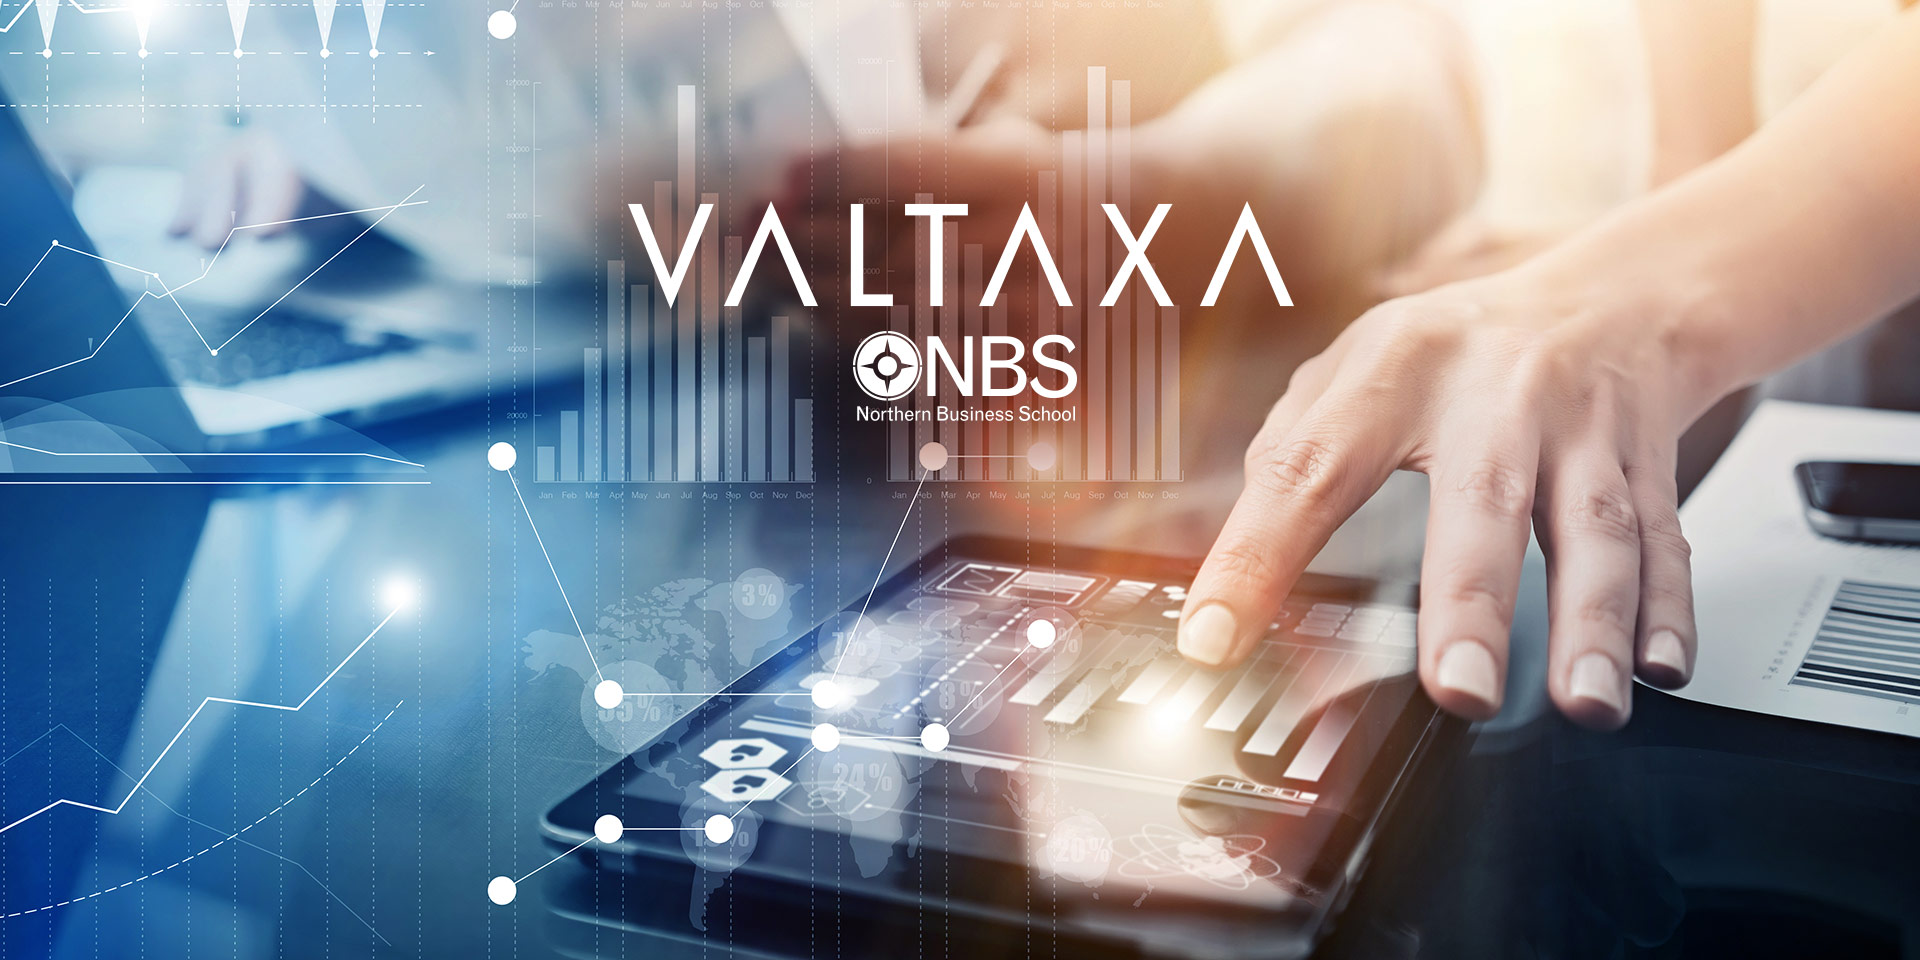 VALTAXA Report